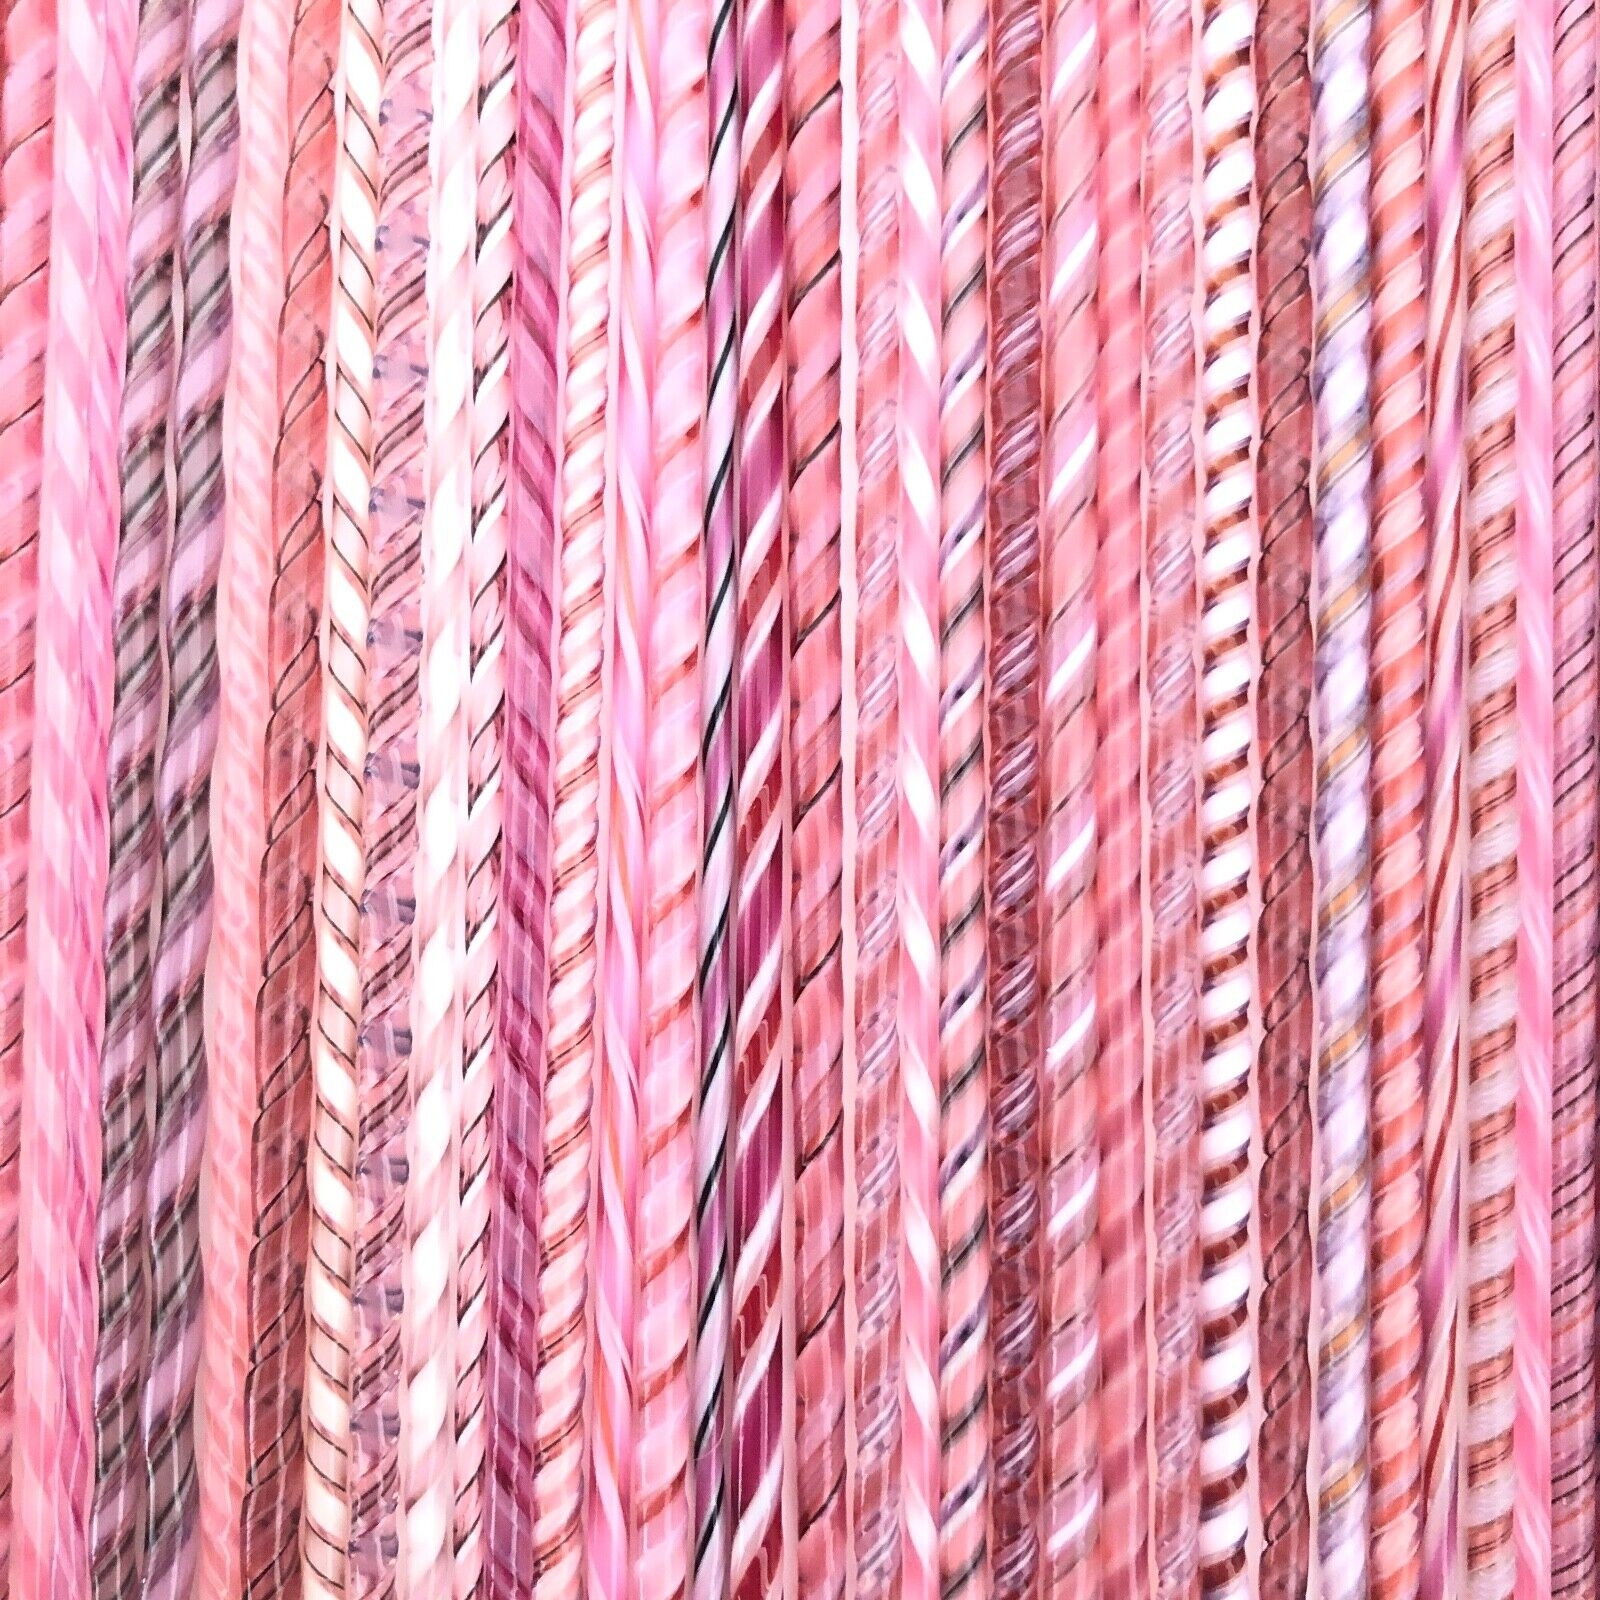 как выглядит FIVE Twisties - Pinks - Fusible COE 90 Bullseye Compatible Twisted Glass Canes фото